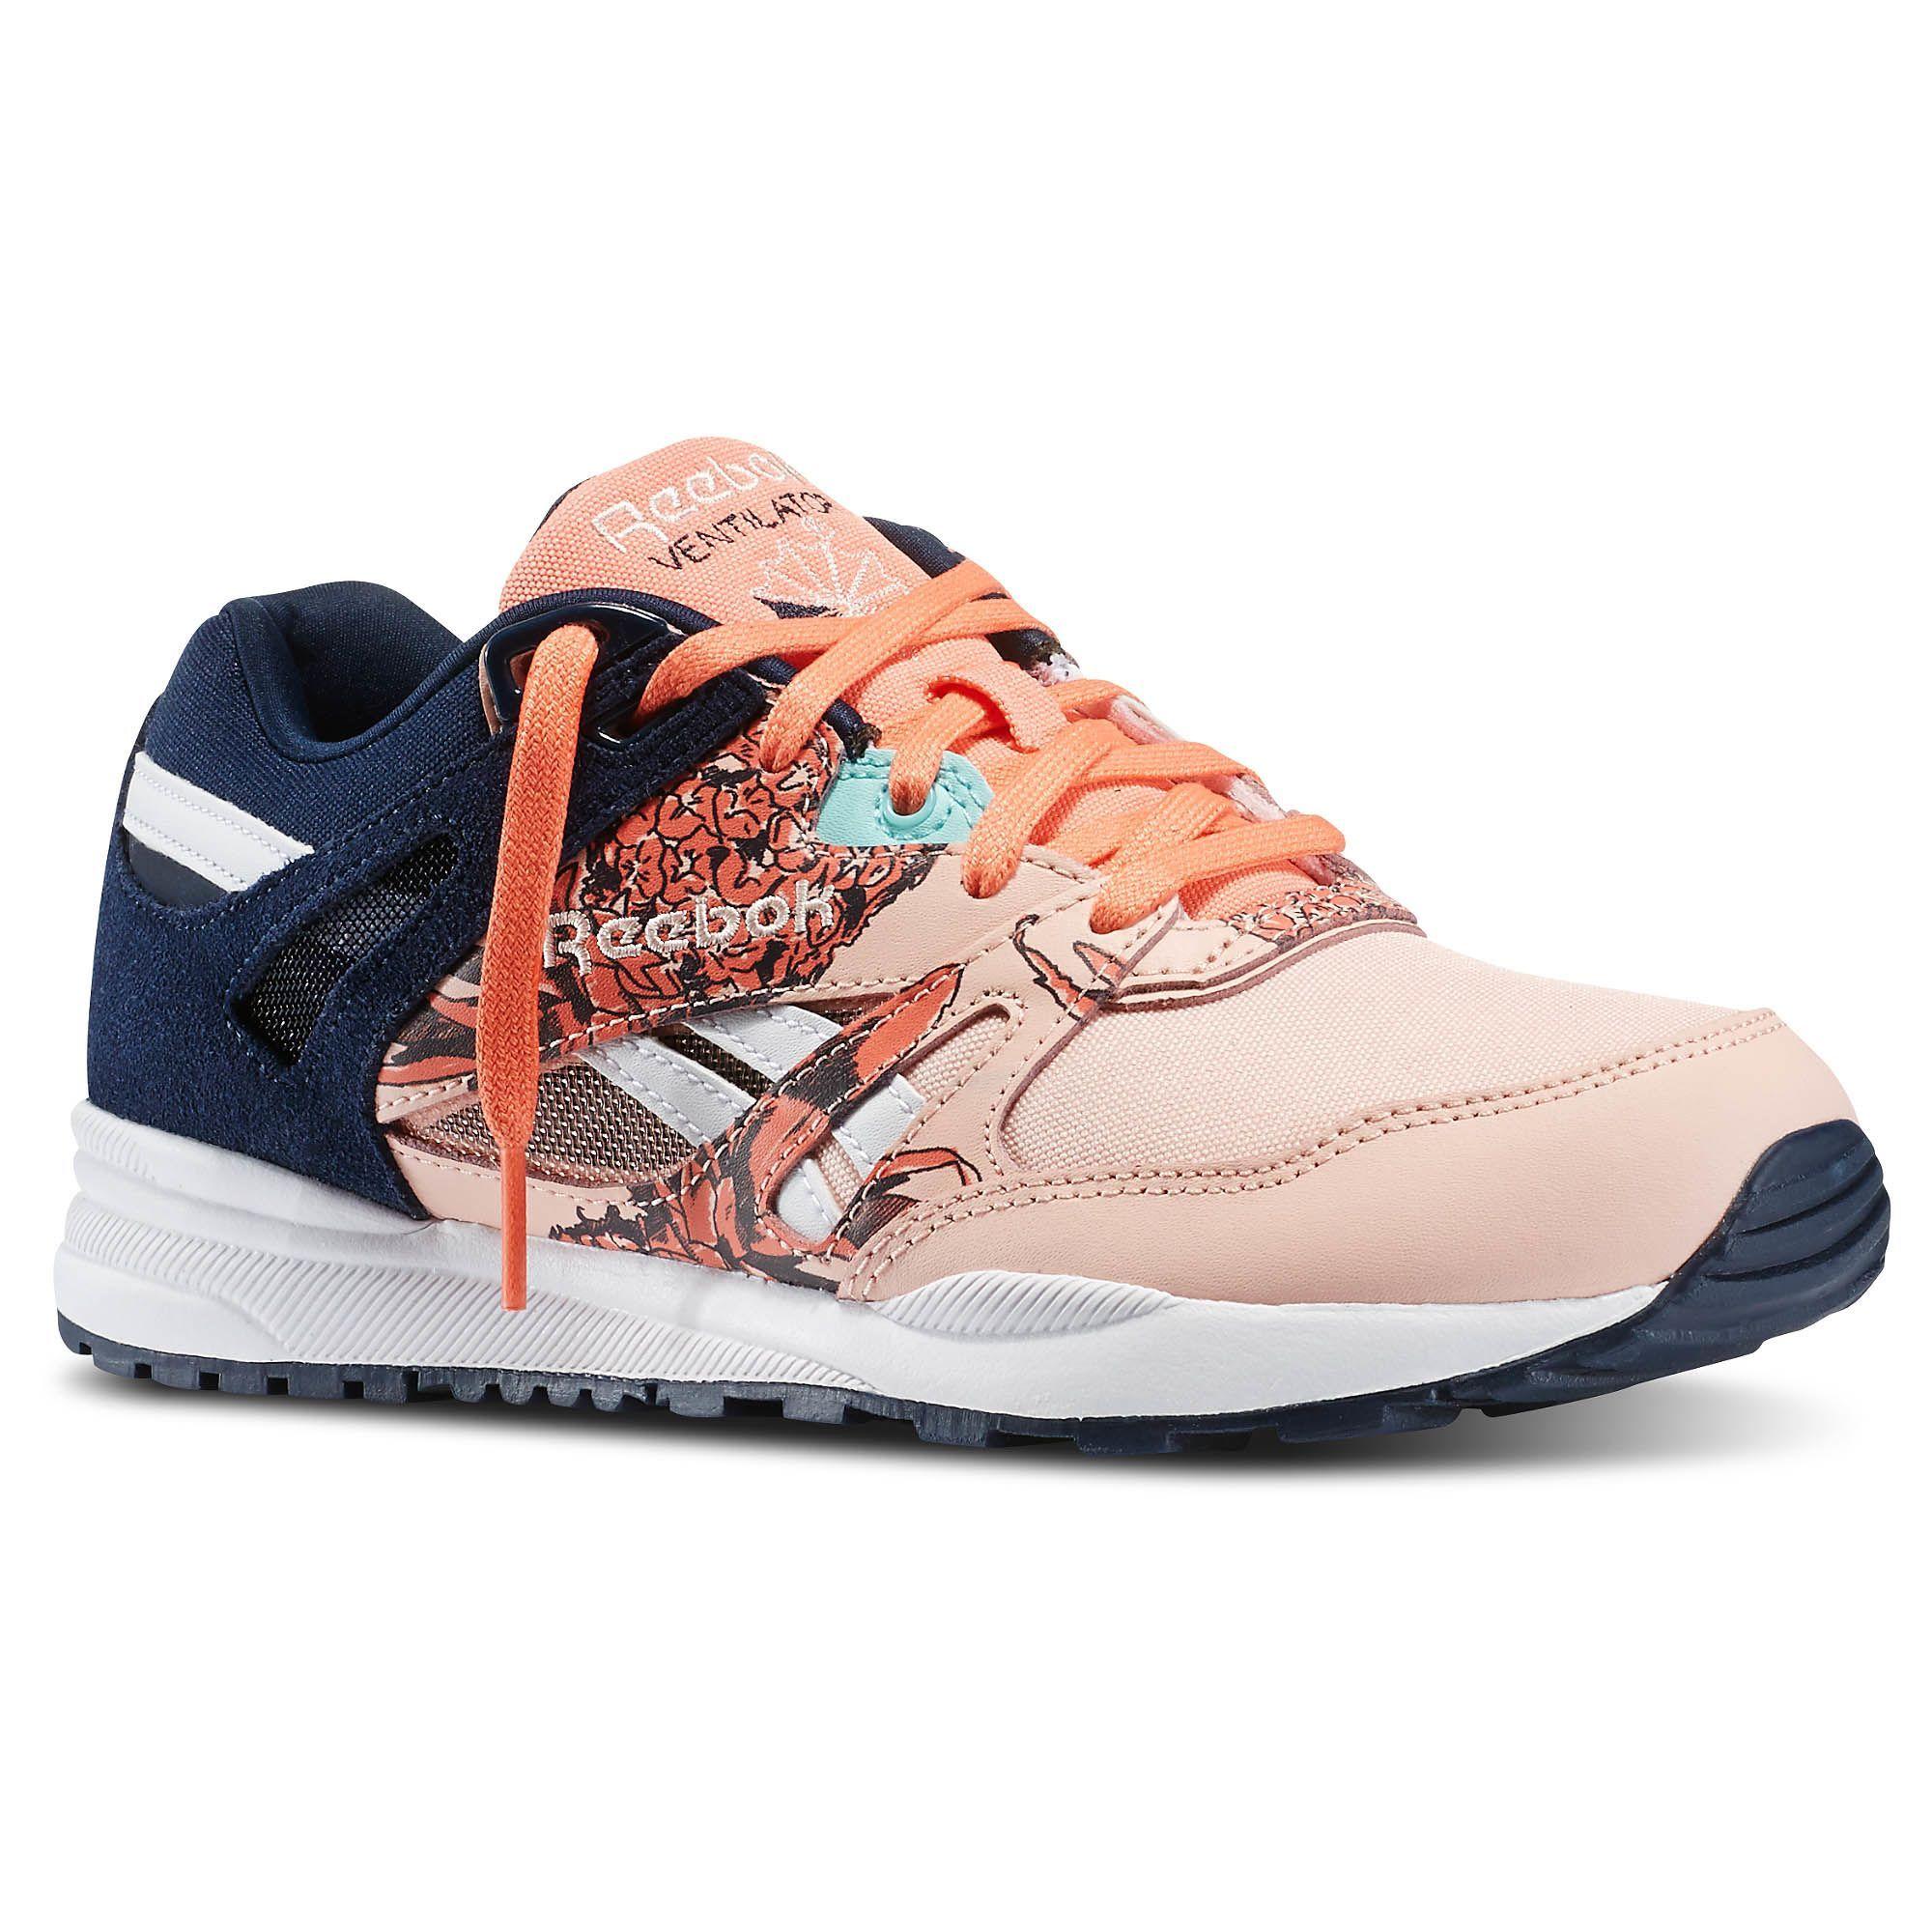 release date e5b4f bd815 Reebok - Ventilator Energize Reebok Classic Trainers, Nike Headbands, Nike  Wedges, Nike Boots